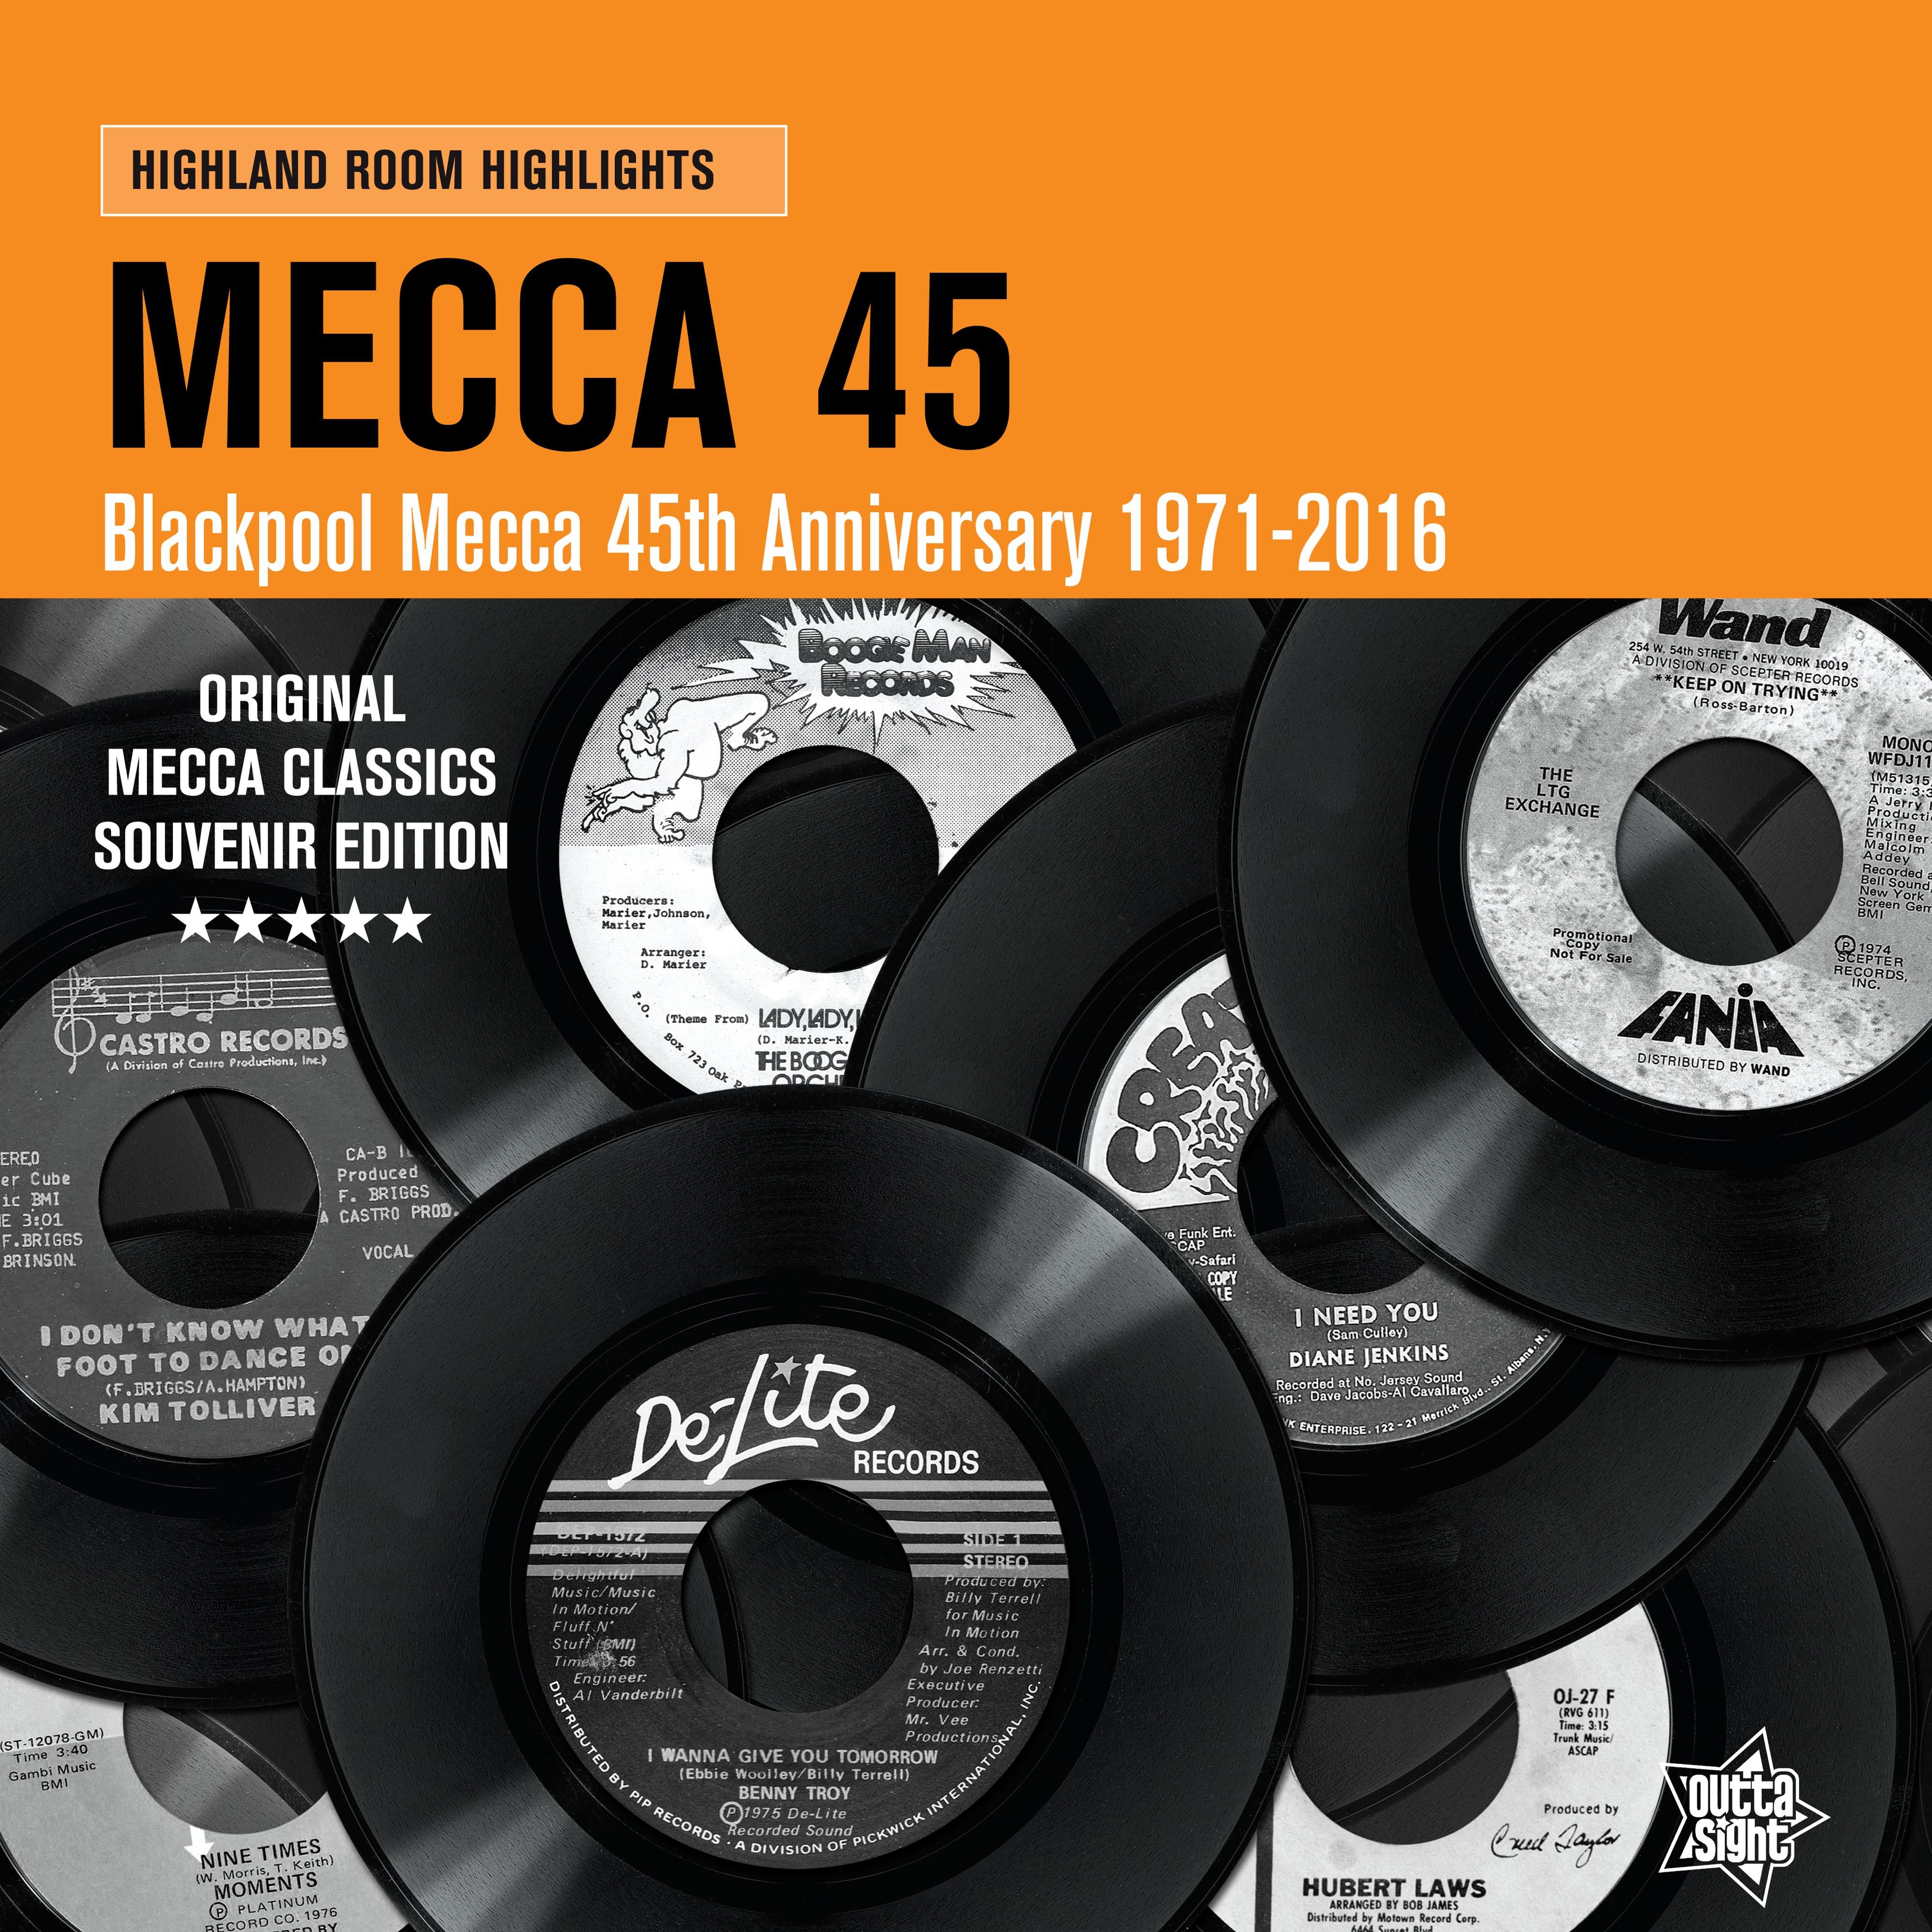 Northern Soul/MECCA 45 LP